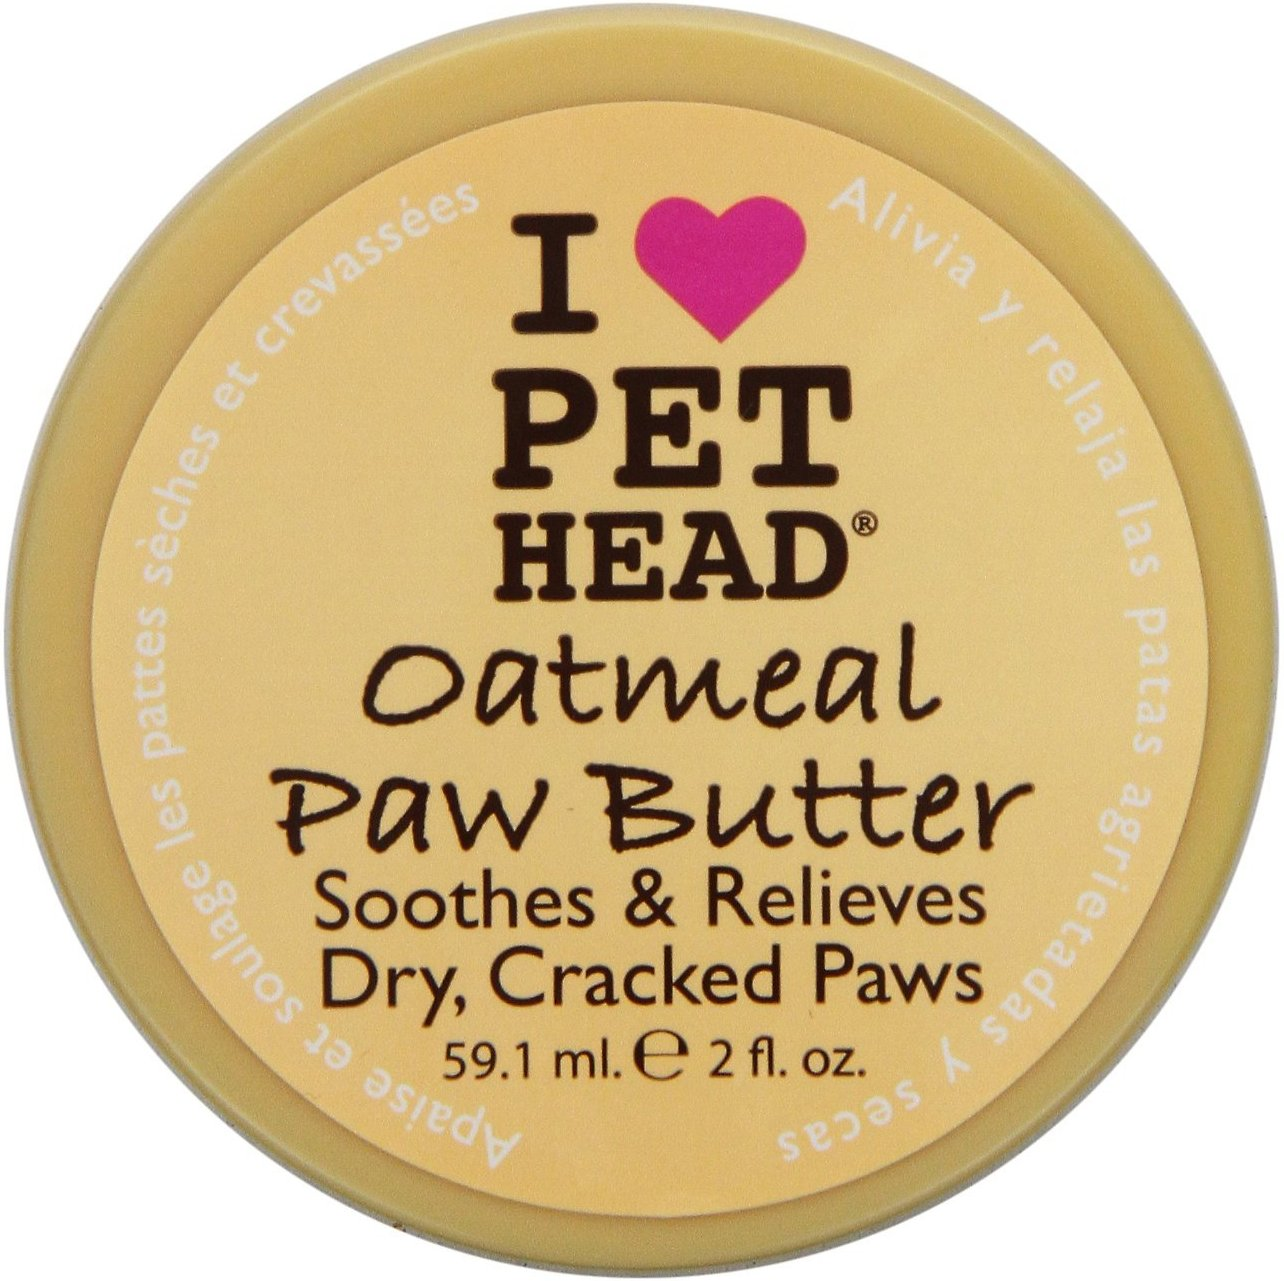 Pet Head Oatmeal Paw Butter 2 oz.